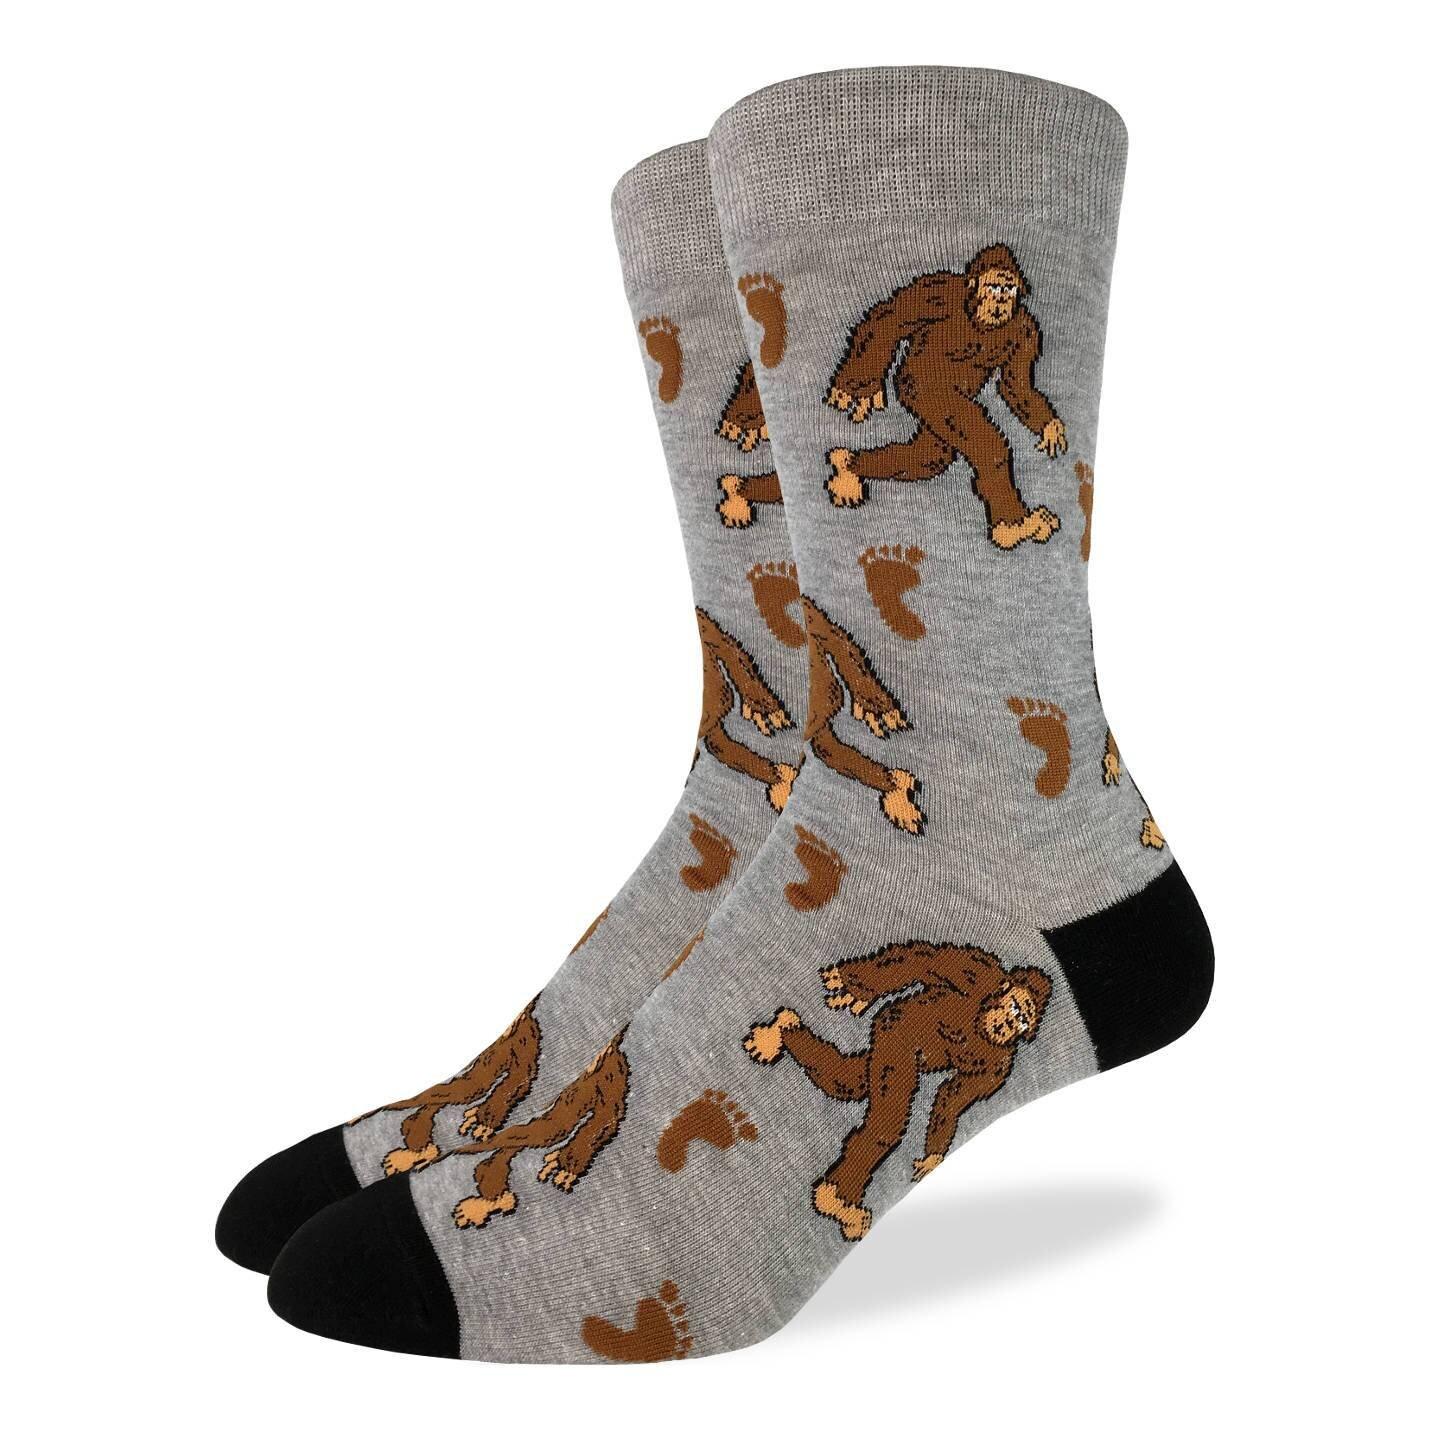 Mens Big Foot Socks  The Last Temptation